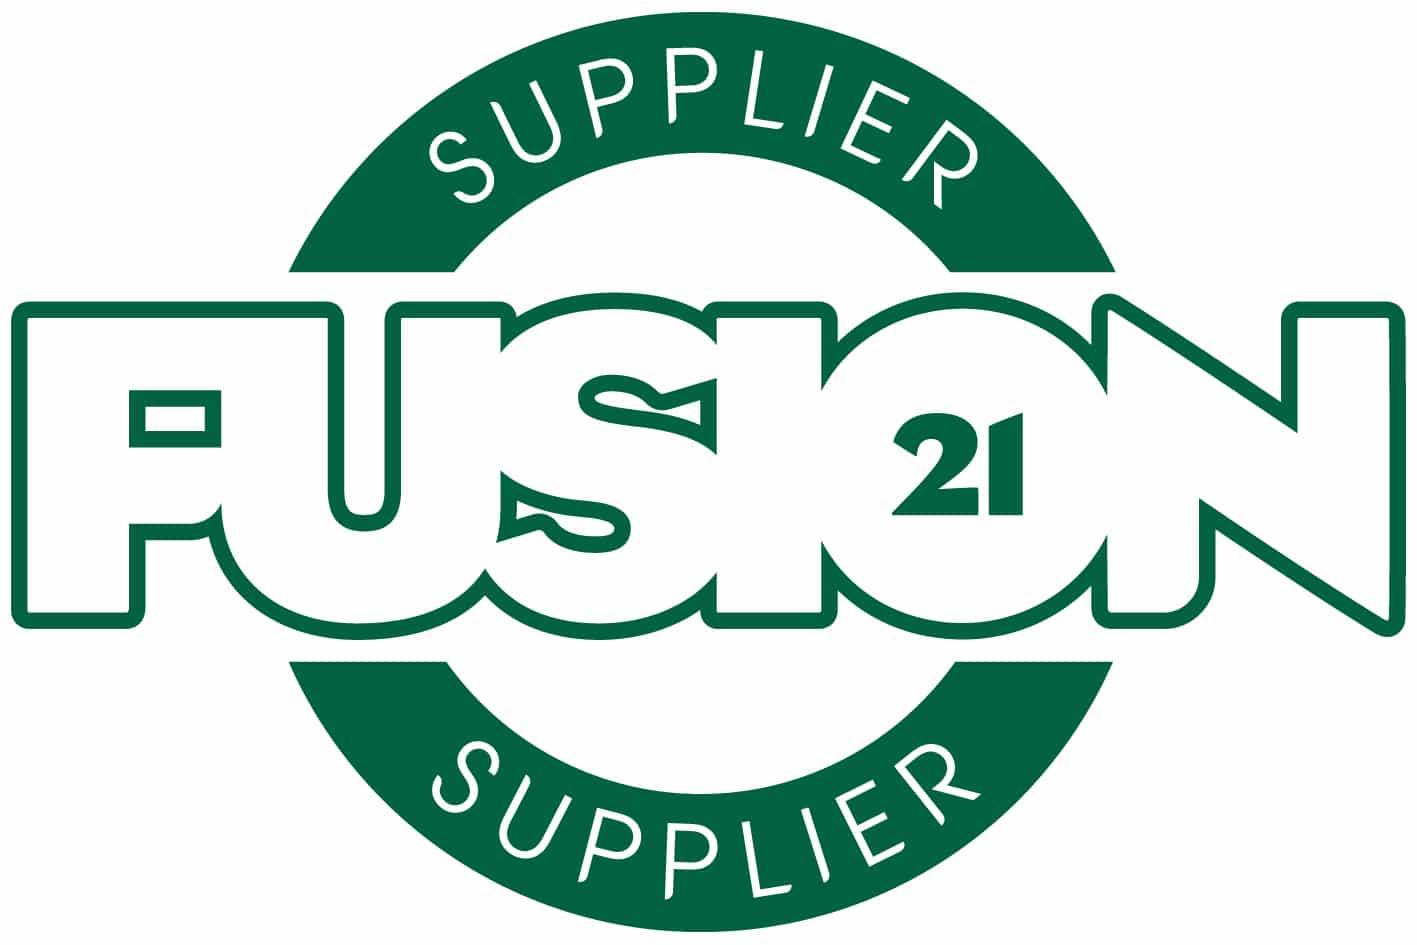 fusion21 framework supplier logo